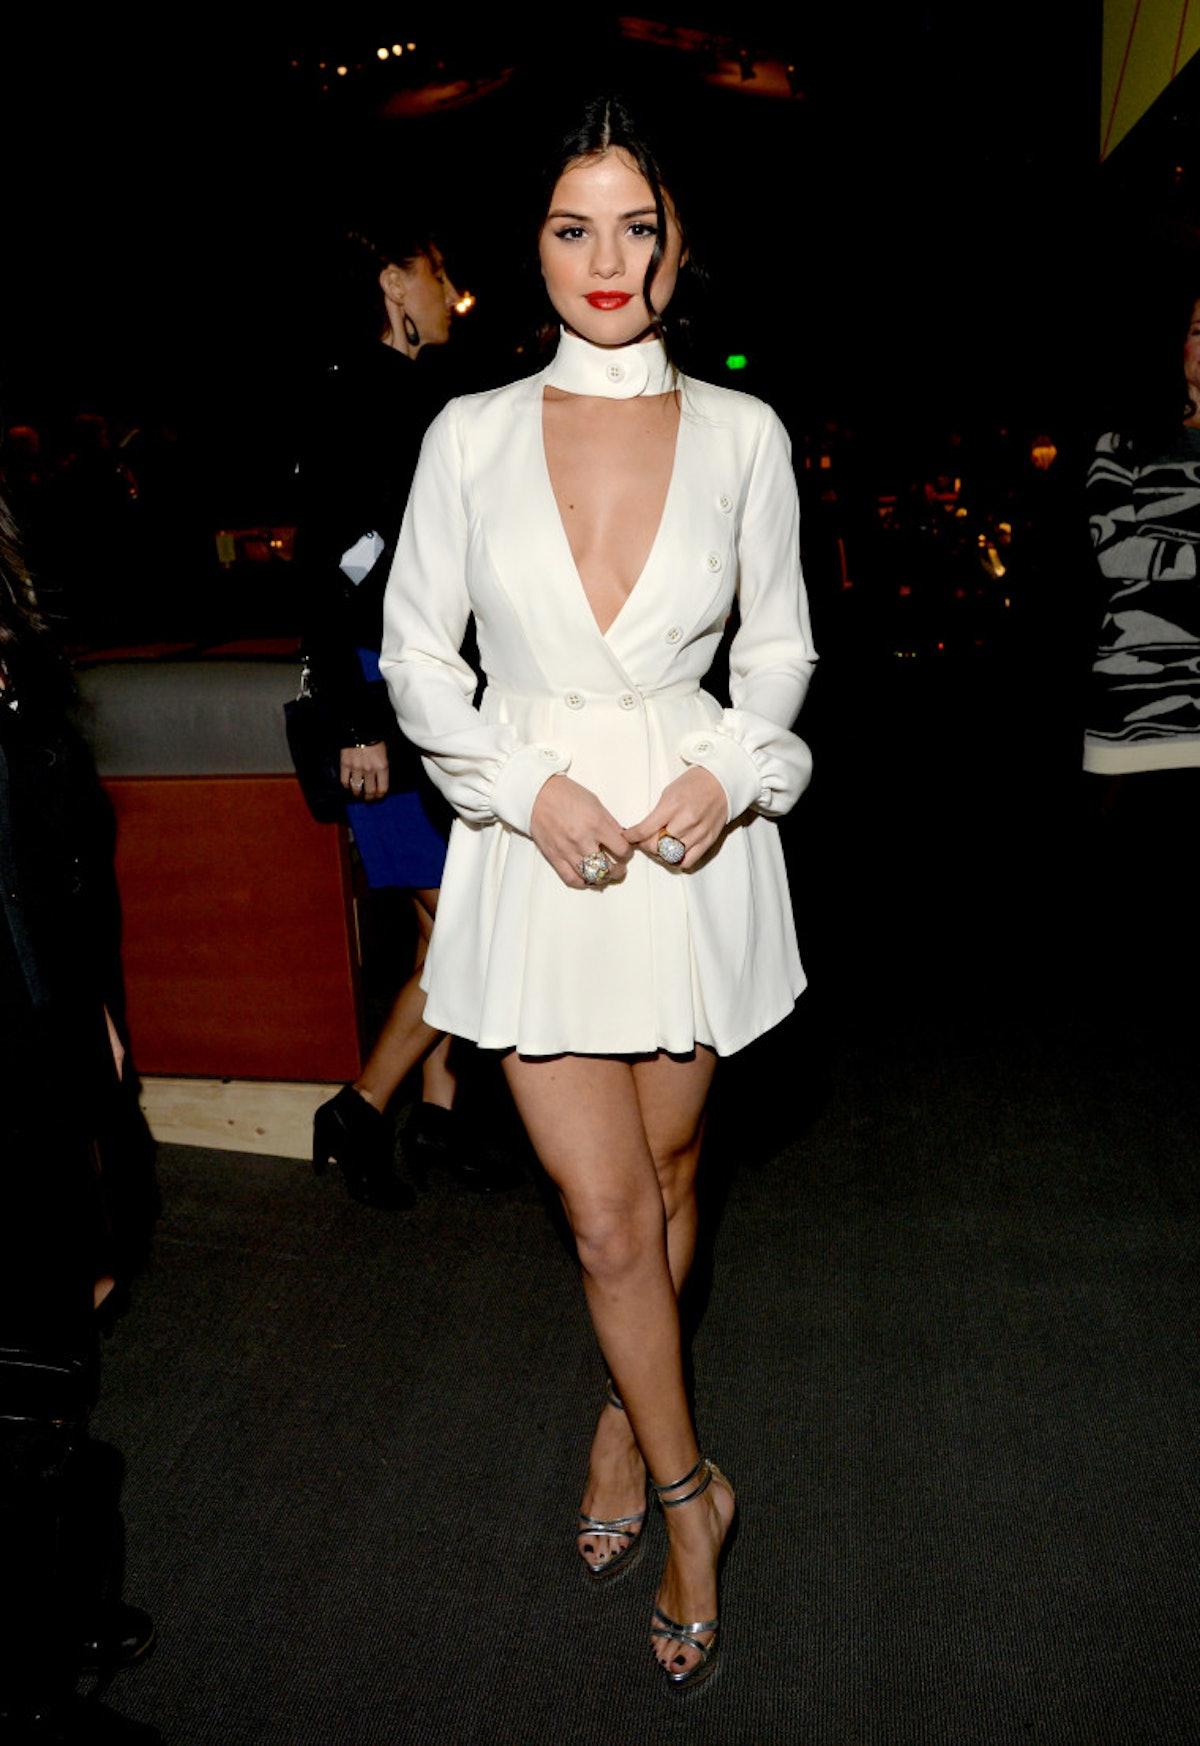 Selena Gomez in an Ulyana Sergeenko dress